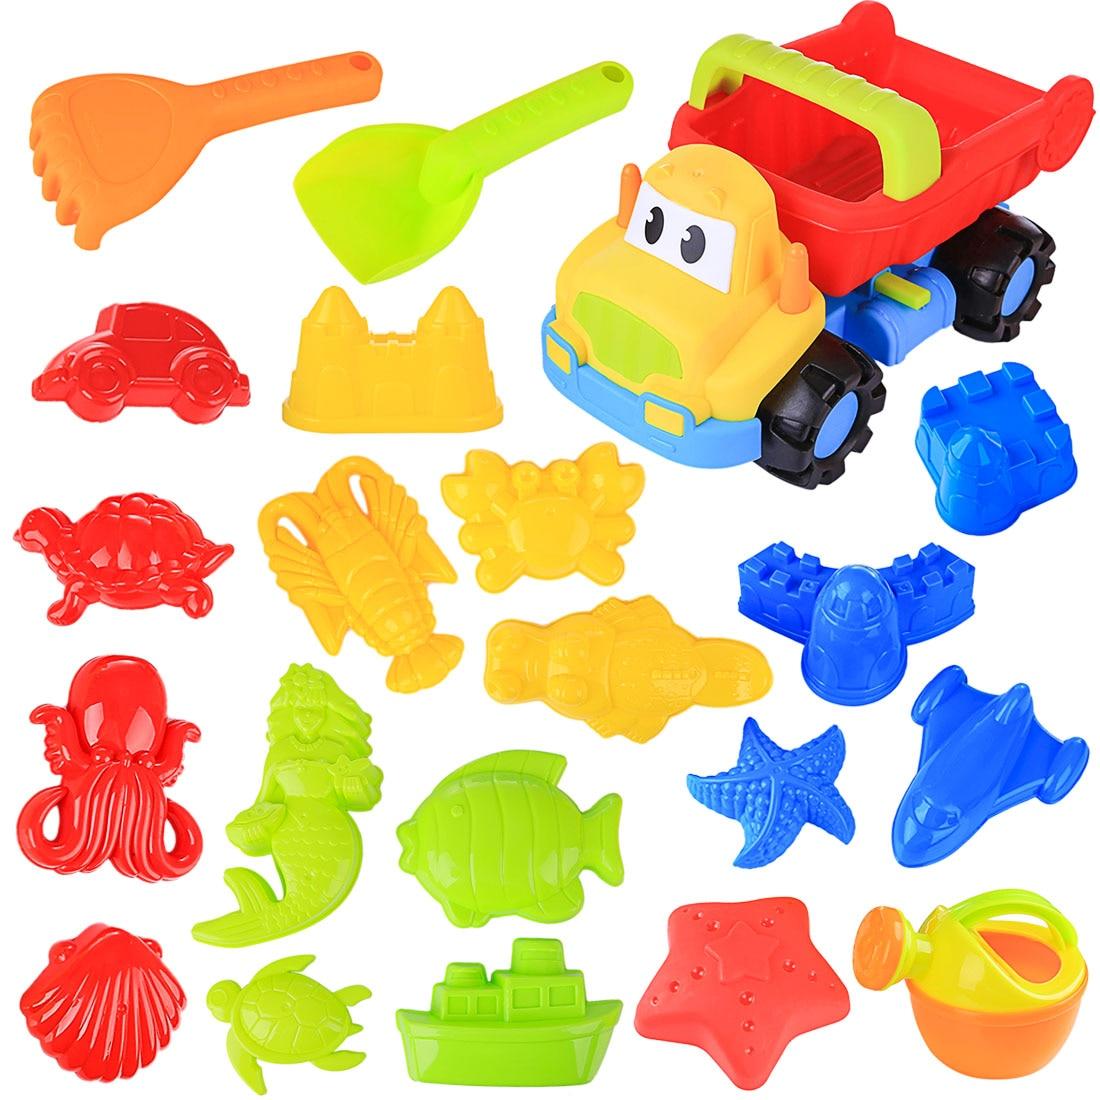 Hot Kids 21Pcs/set Large Size Beach Sand Toys Plastic Beach Car Vehicle Summer Outdoor Playset Drop Ship 2020